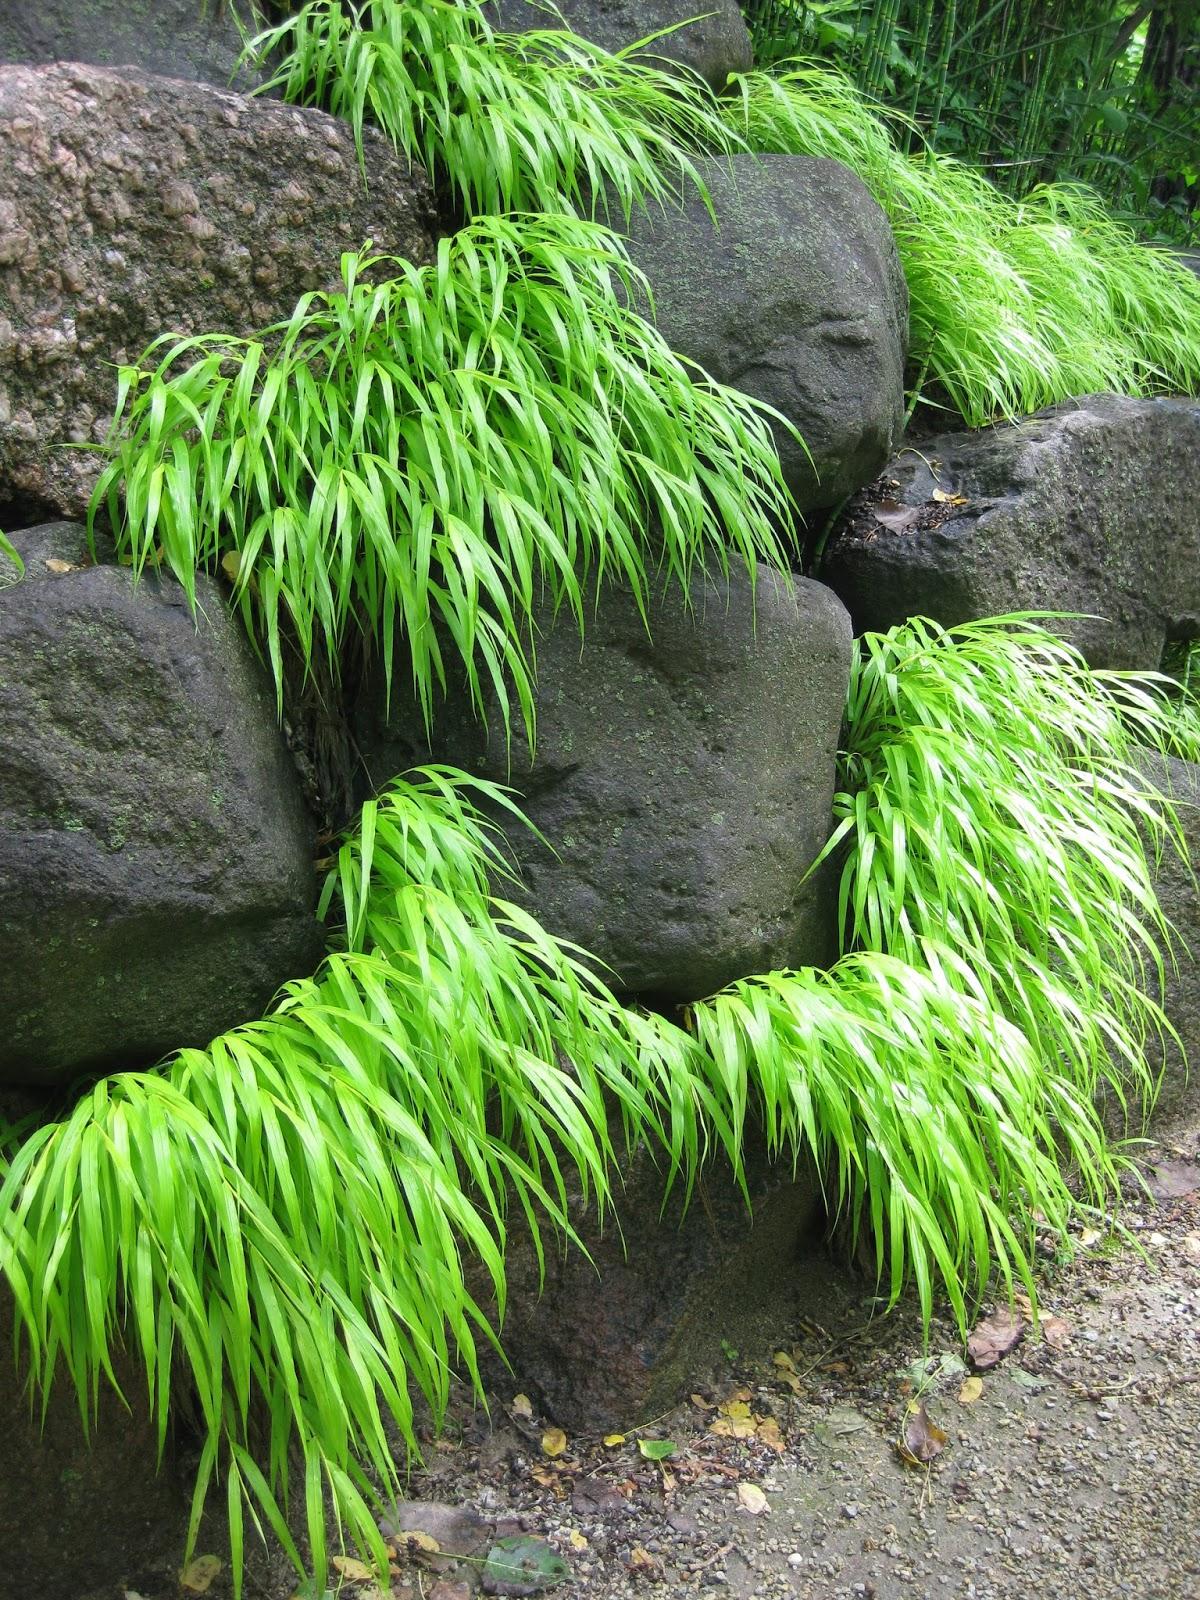 Hort Blog: Perennial Grasses